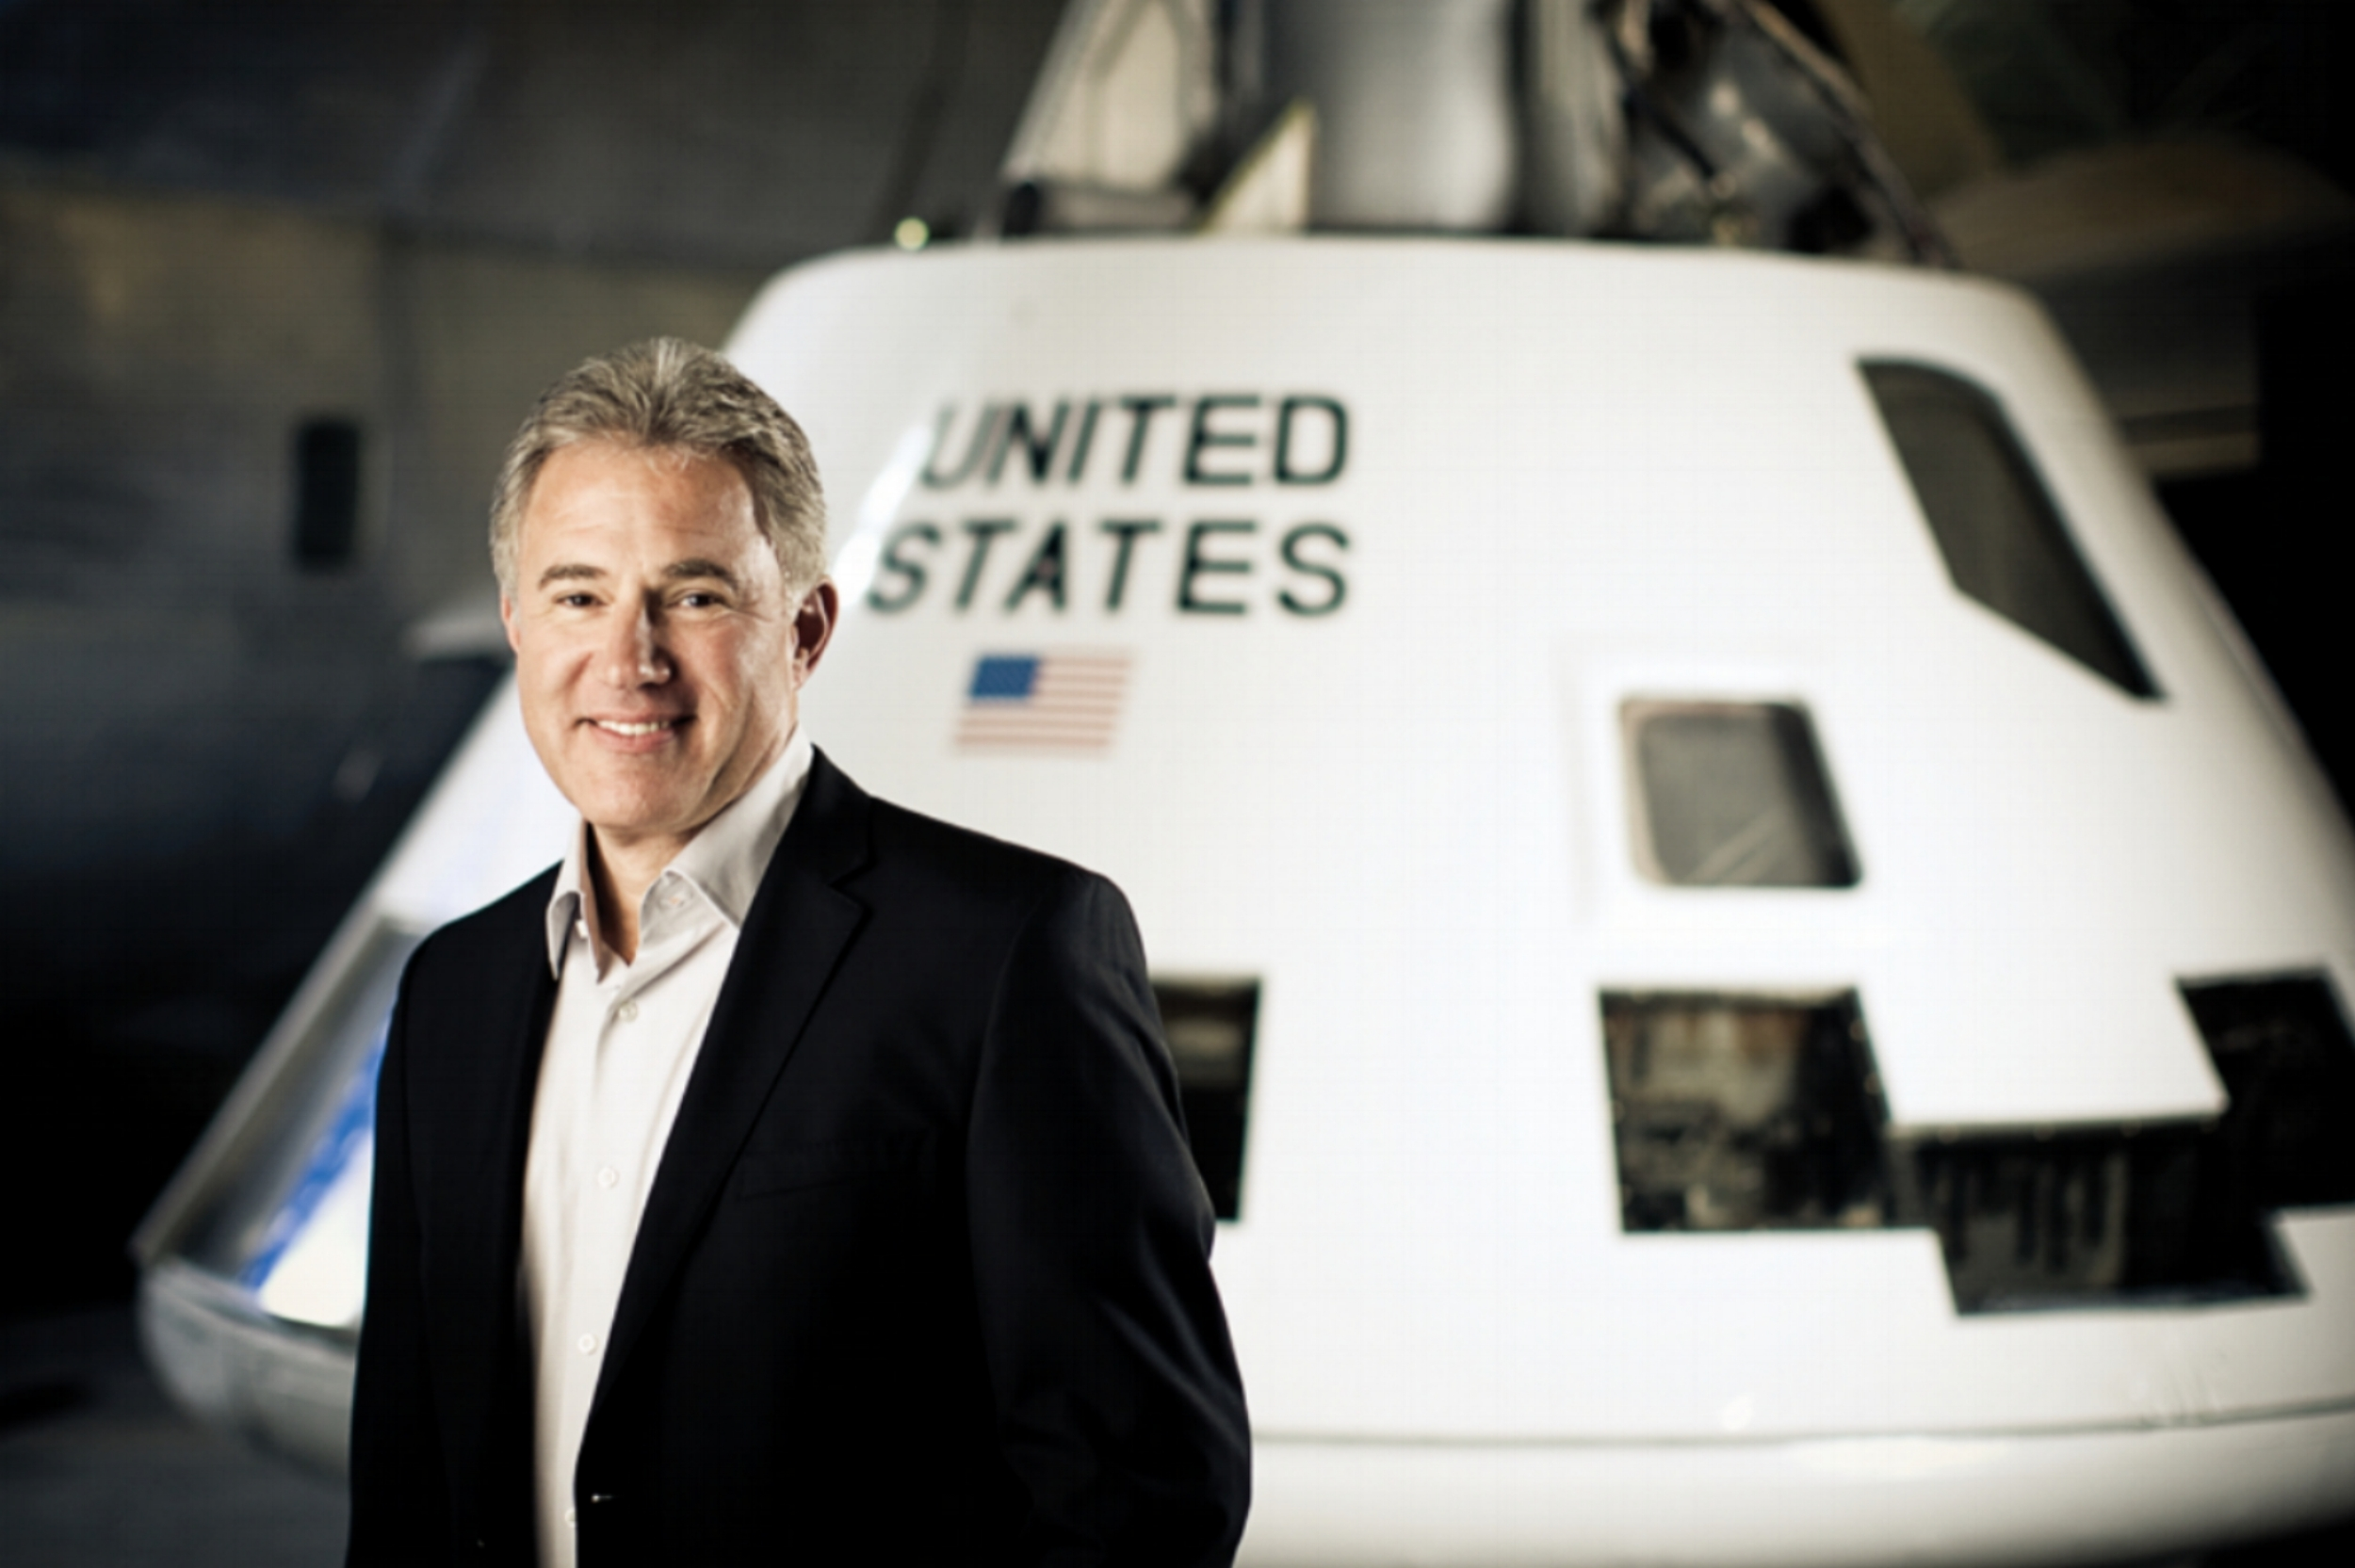 Dr James Logan--Chief, Spaceflight Medical Officer